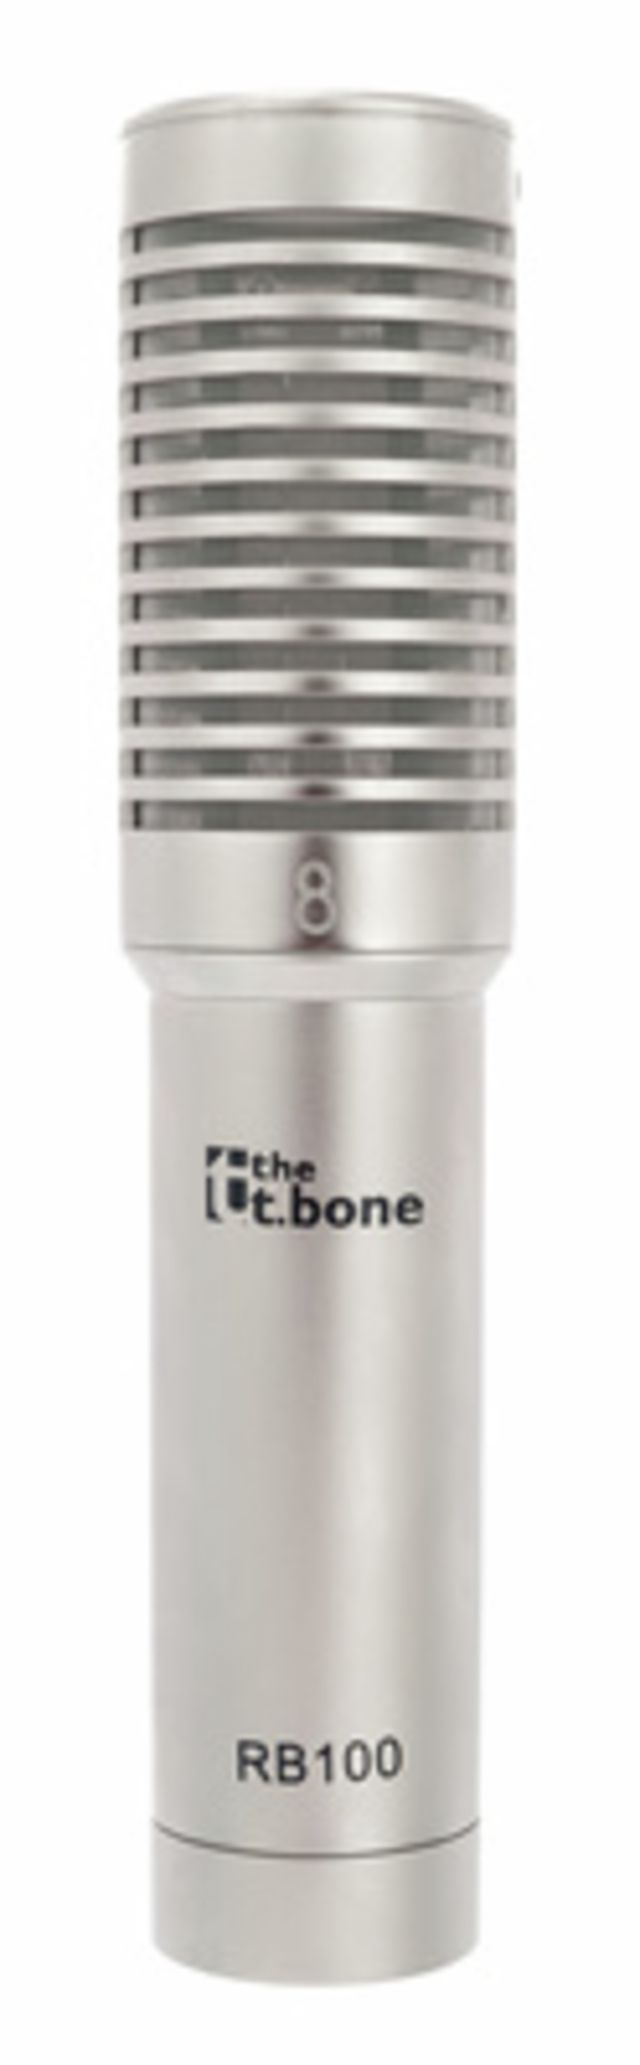 the t.bone RB 100